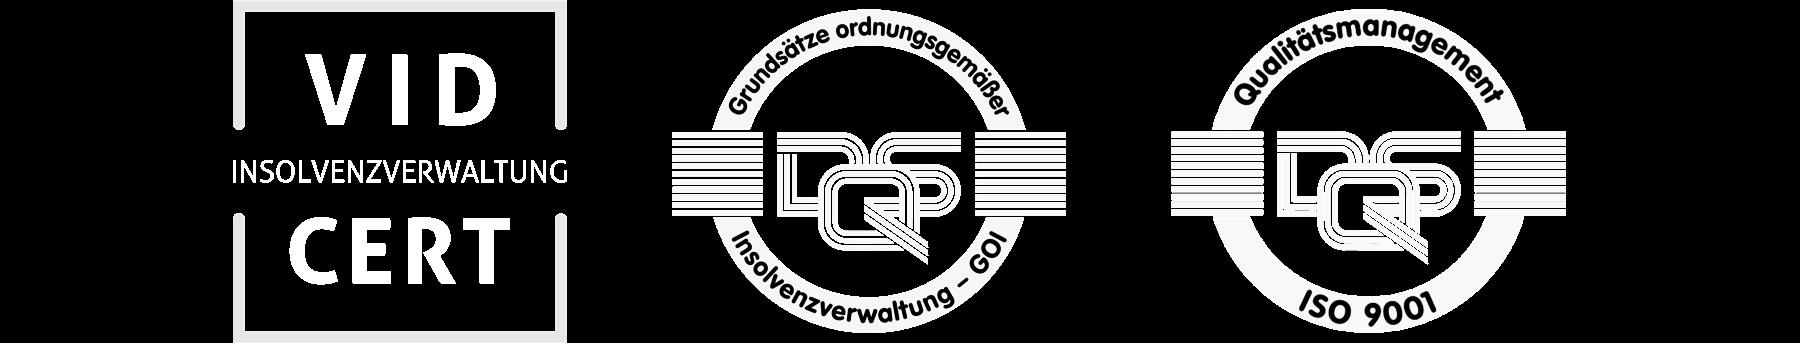 CERT_Logos.png